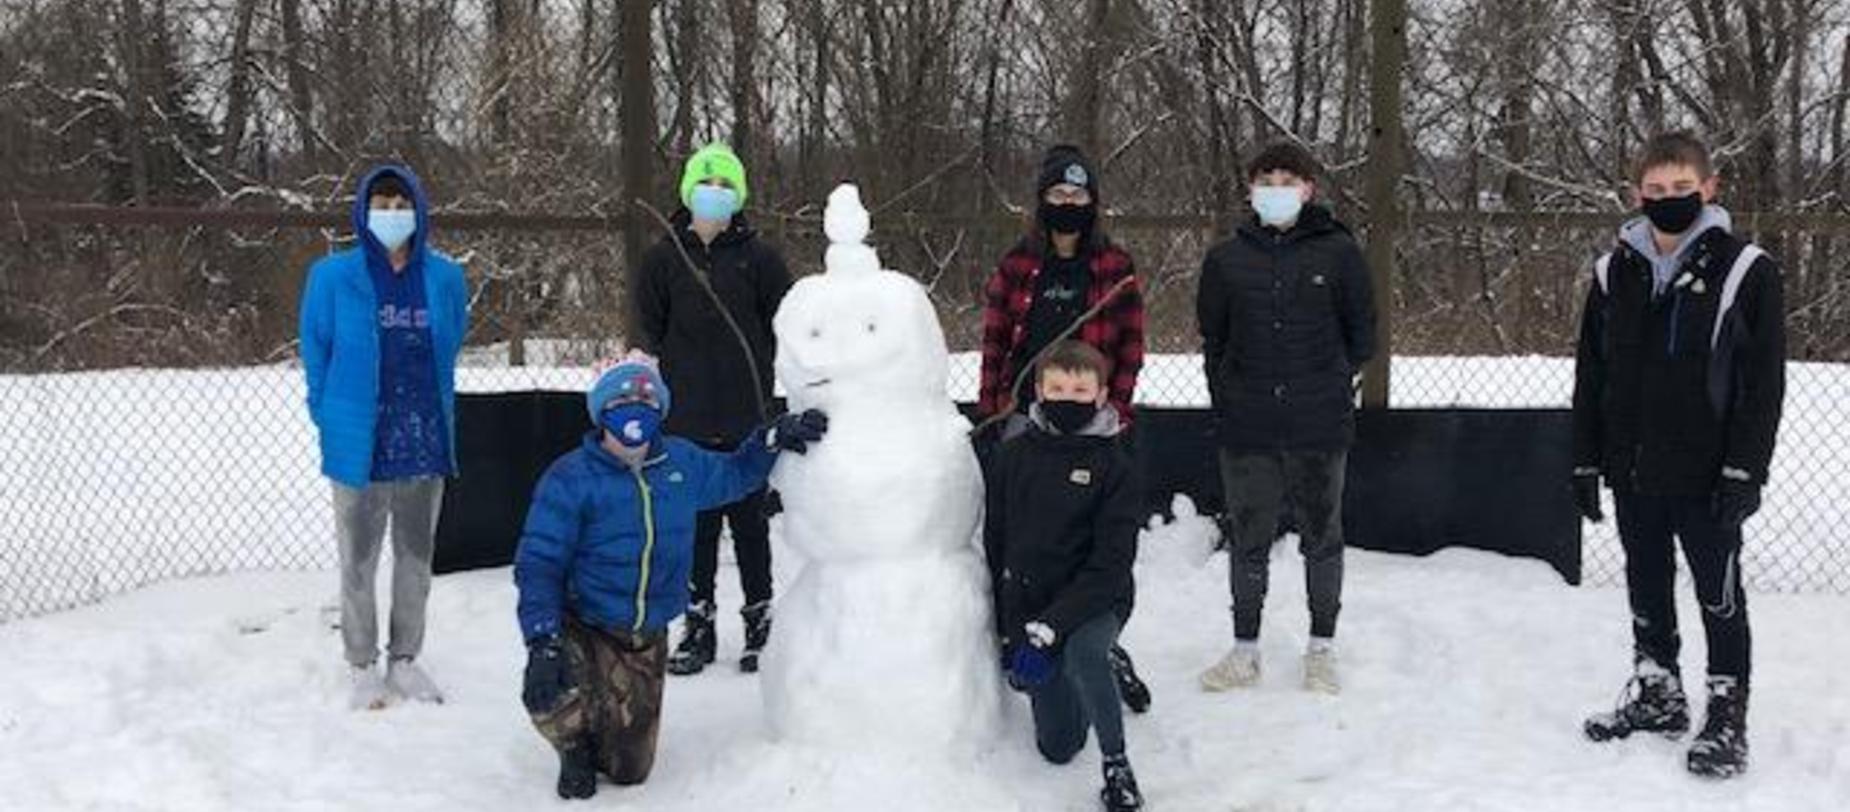 Teamwork to build a snowman